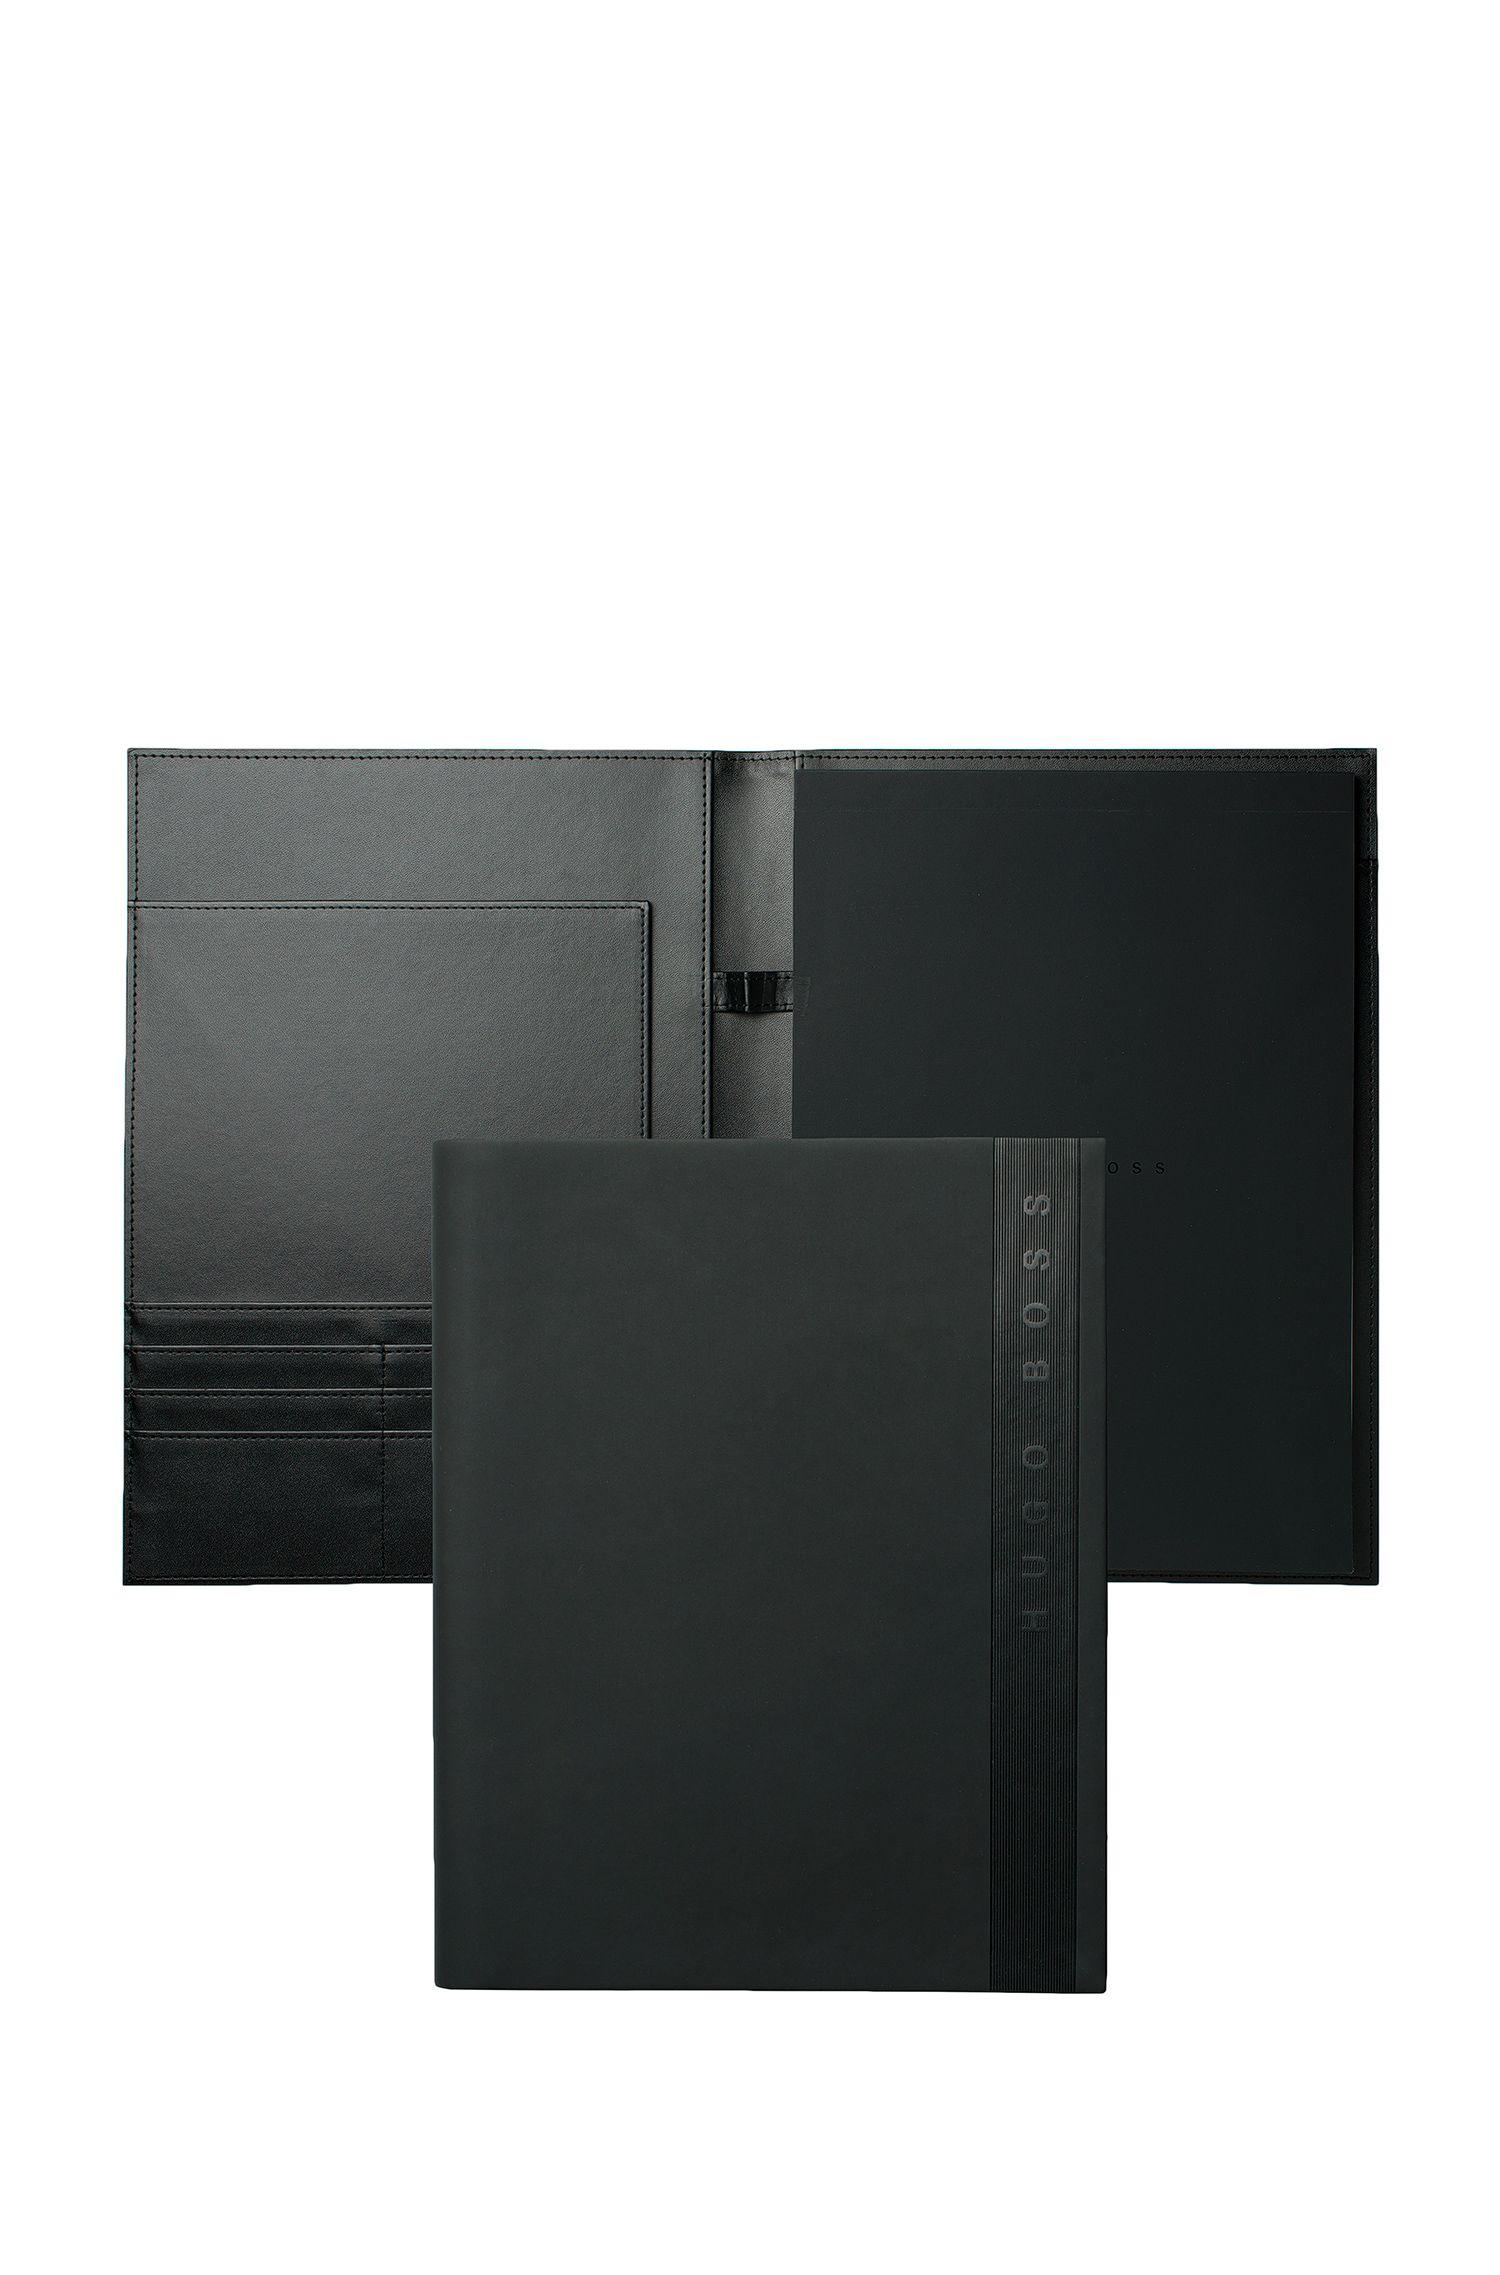 Schwarze DIN-A4-Mappe aus Kunstleder, Schwarz